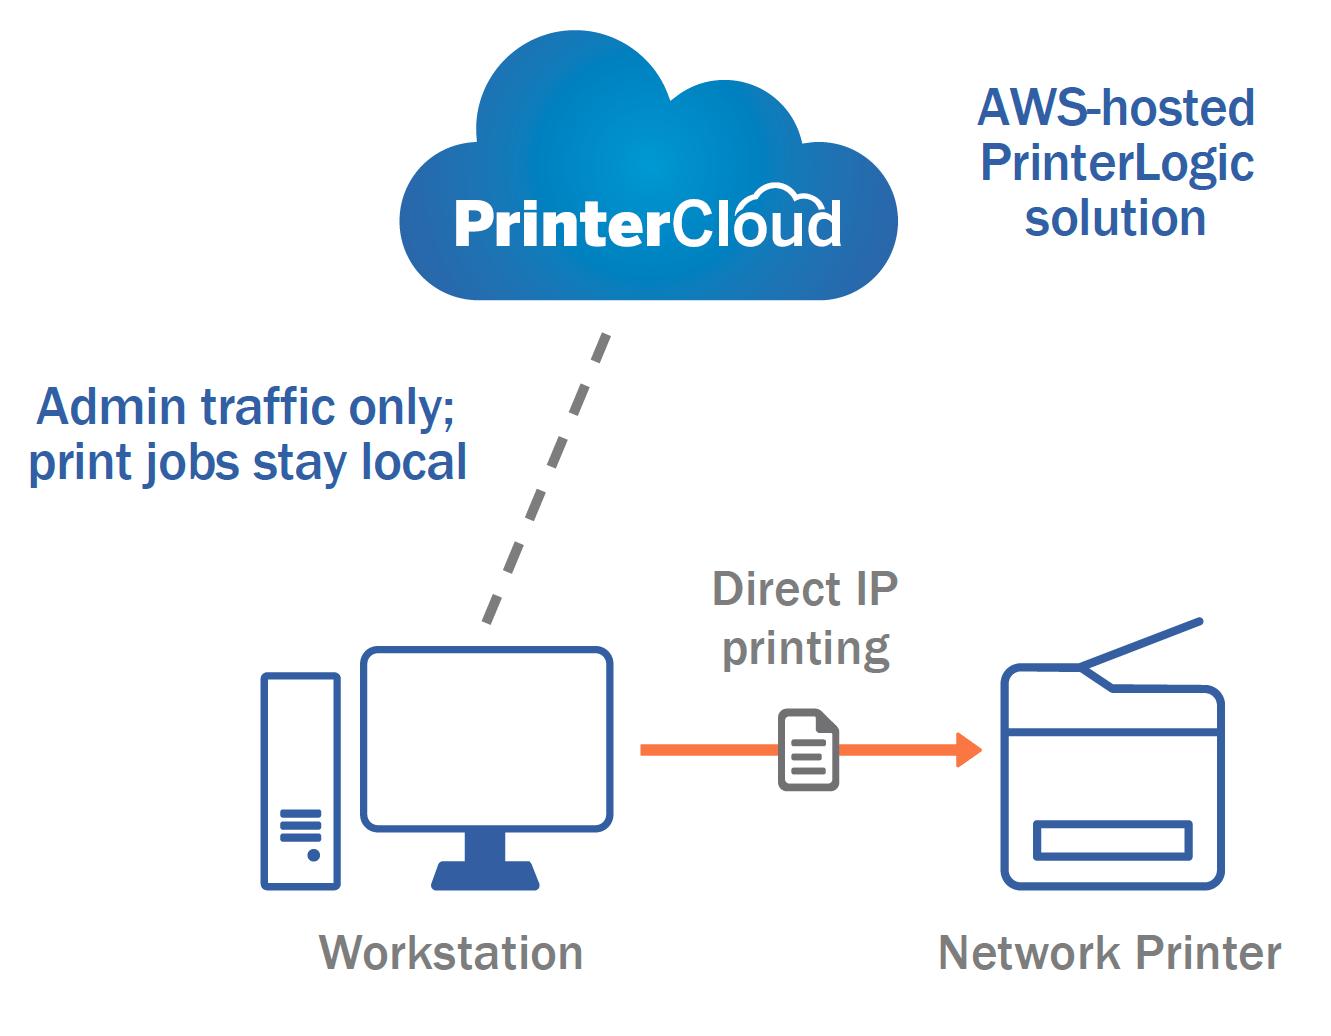 Acer e PrinterLogic siglano una partnership per nuove soluzioni cloud based